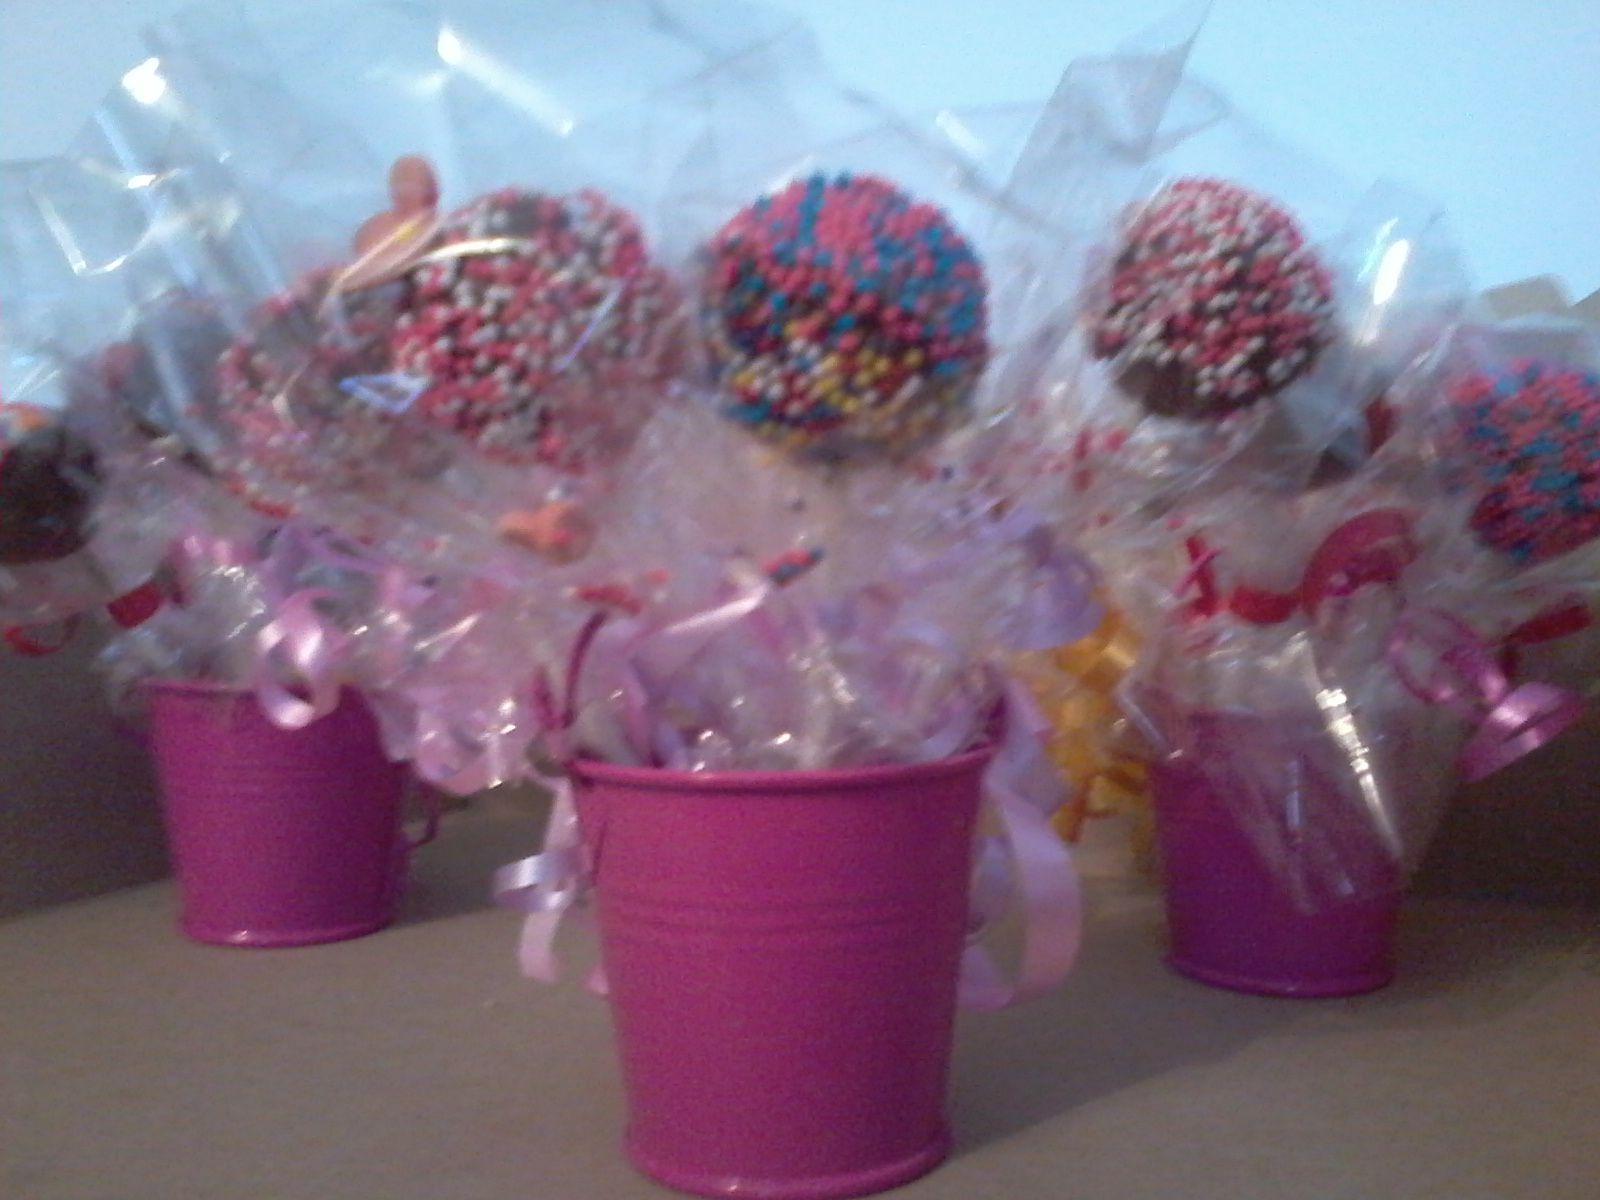 Baldes con cake pops para sorpresas de cumplea os - Detalles originales para cumpleanos infantiles ...